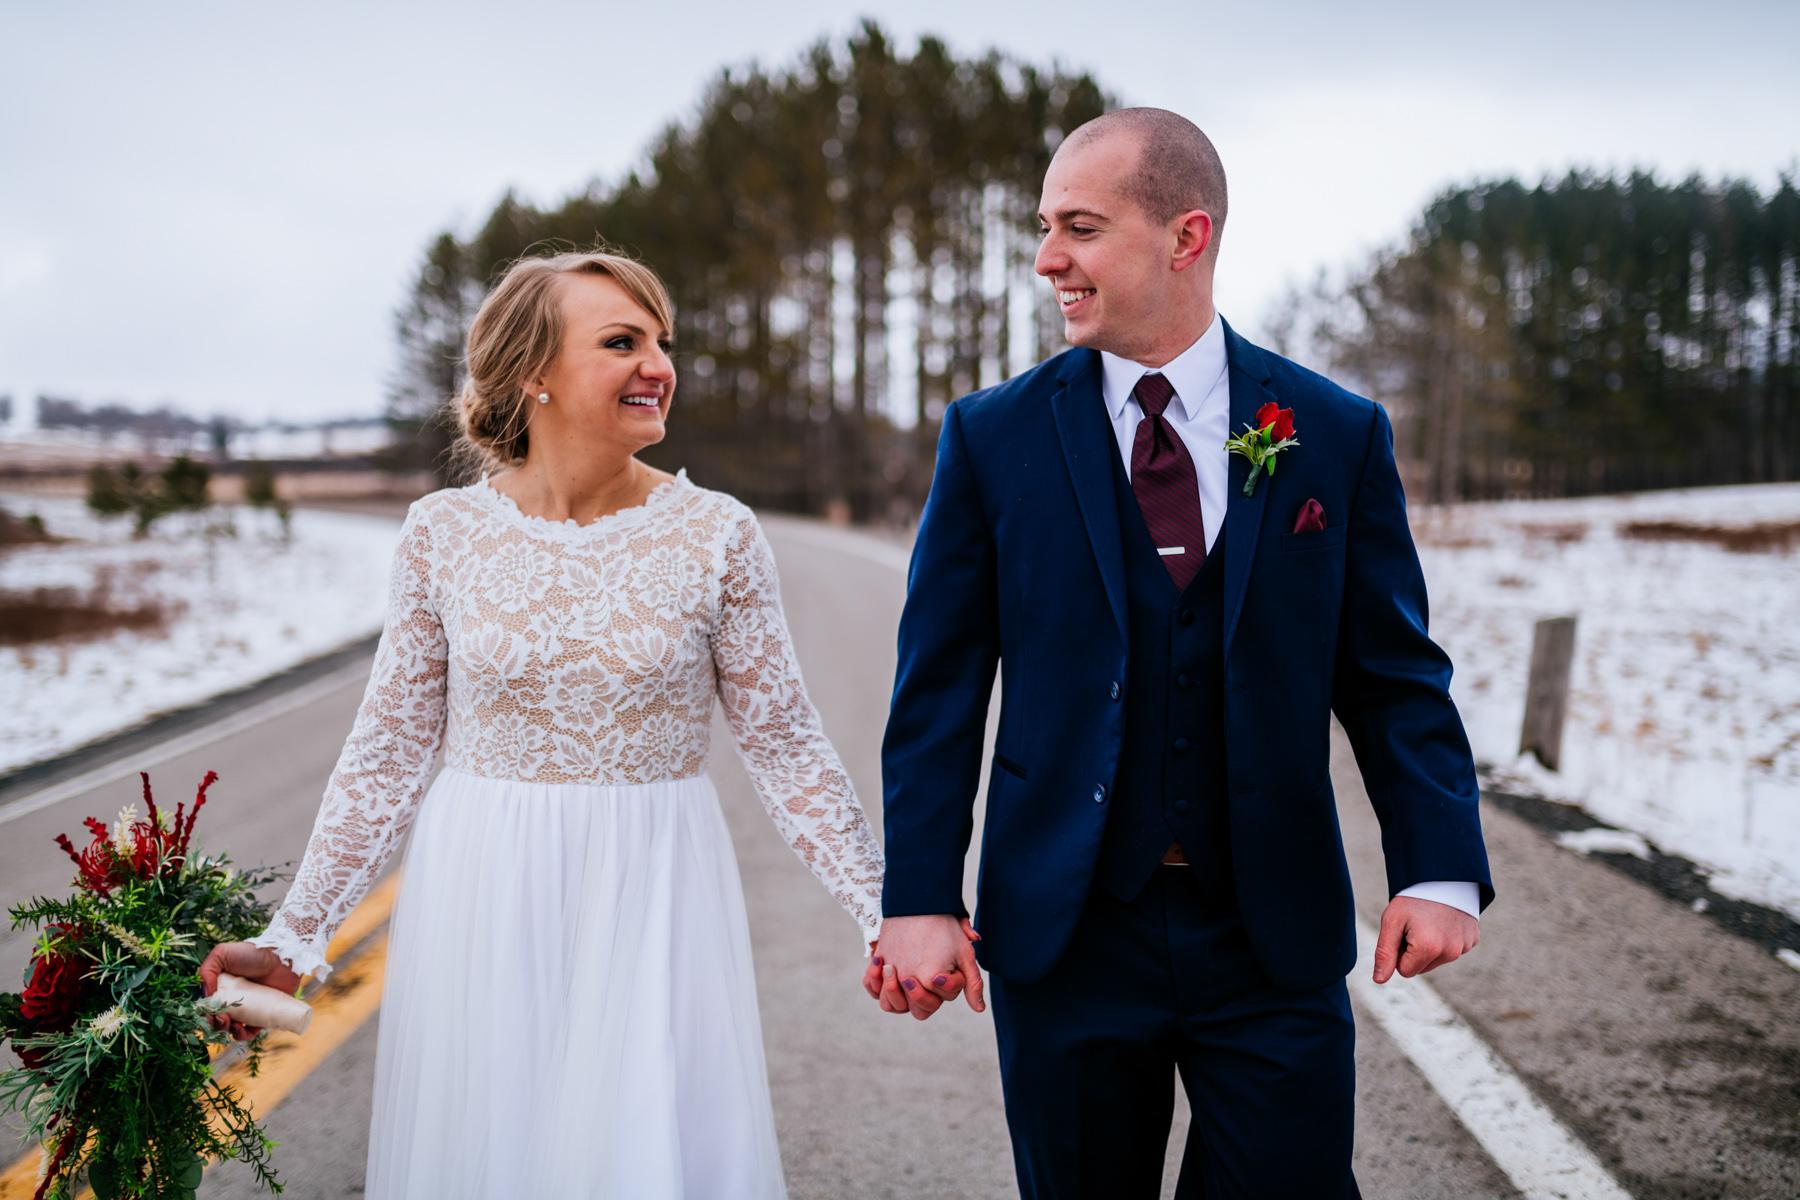 wedding couple strolling down road in winter